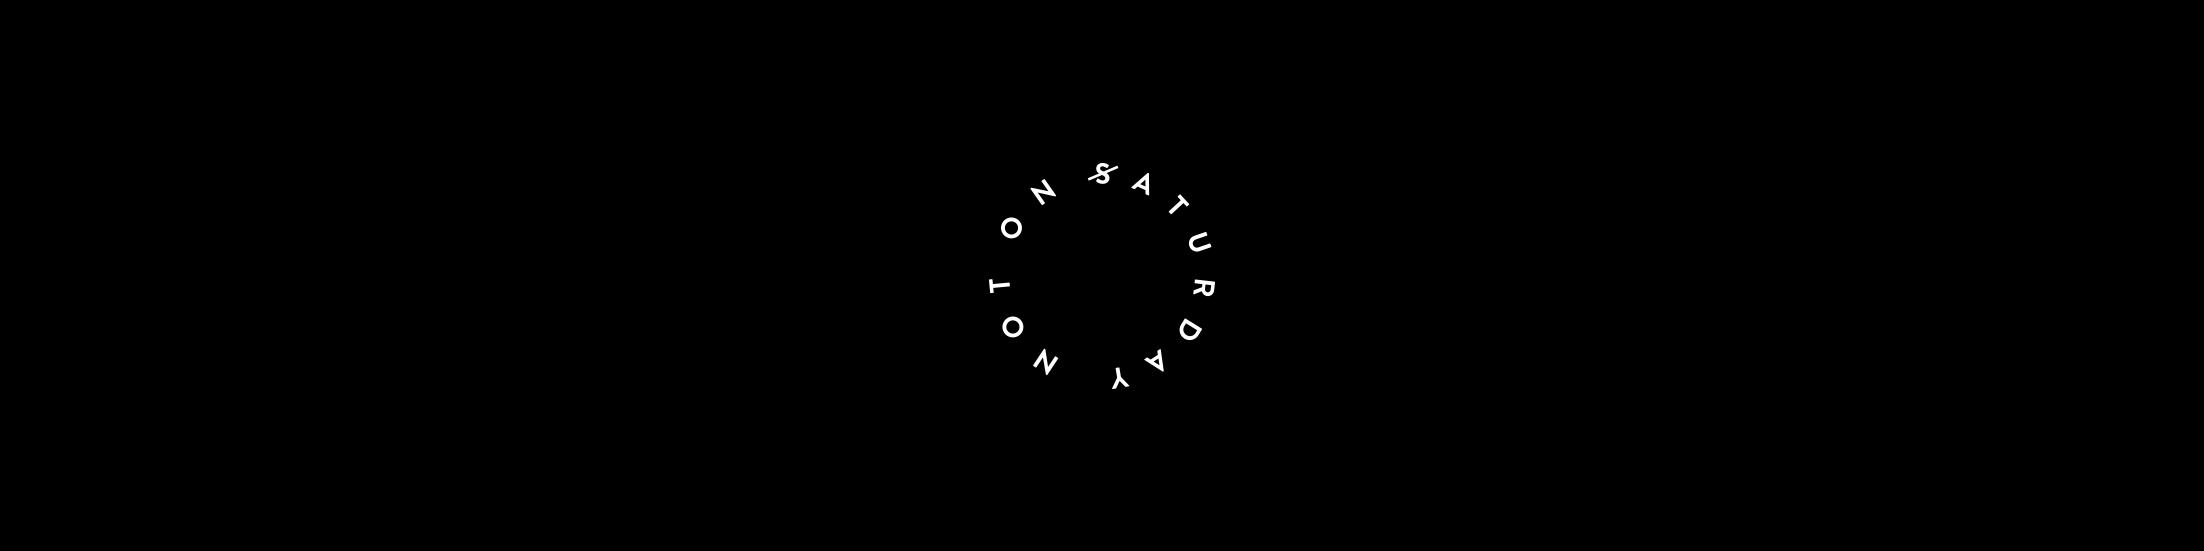 NOTONSATURDAY_ROUND_02_black